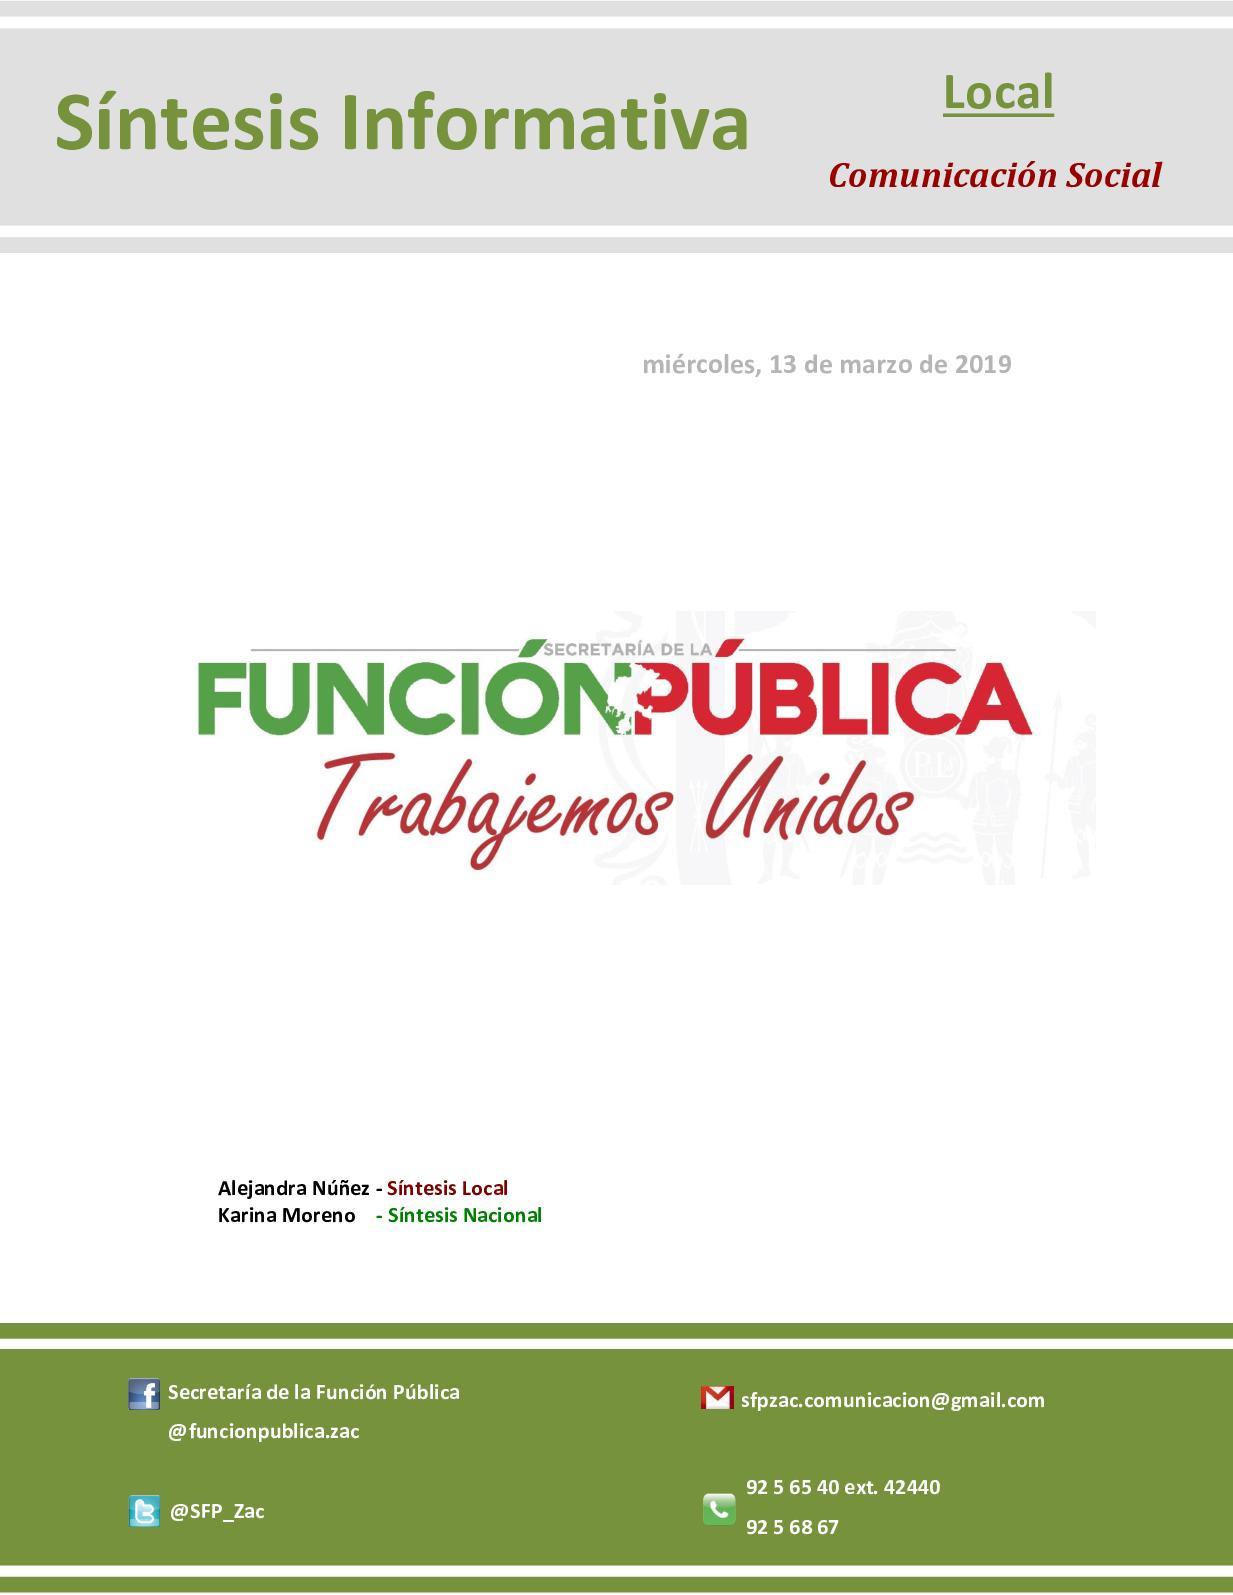 Síntesis Local-Nacional de Comunicación Social de la SFP 13-03-2019